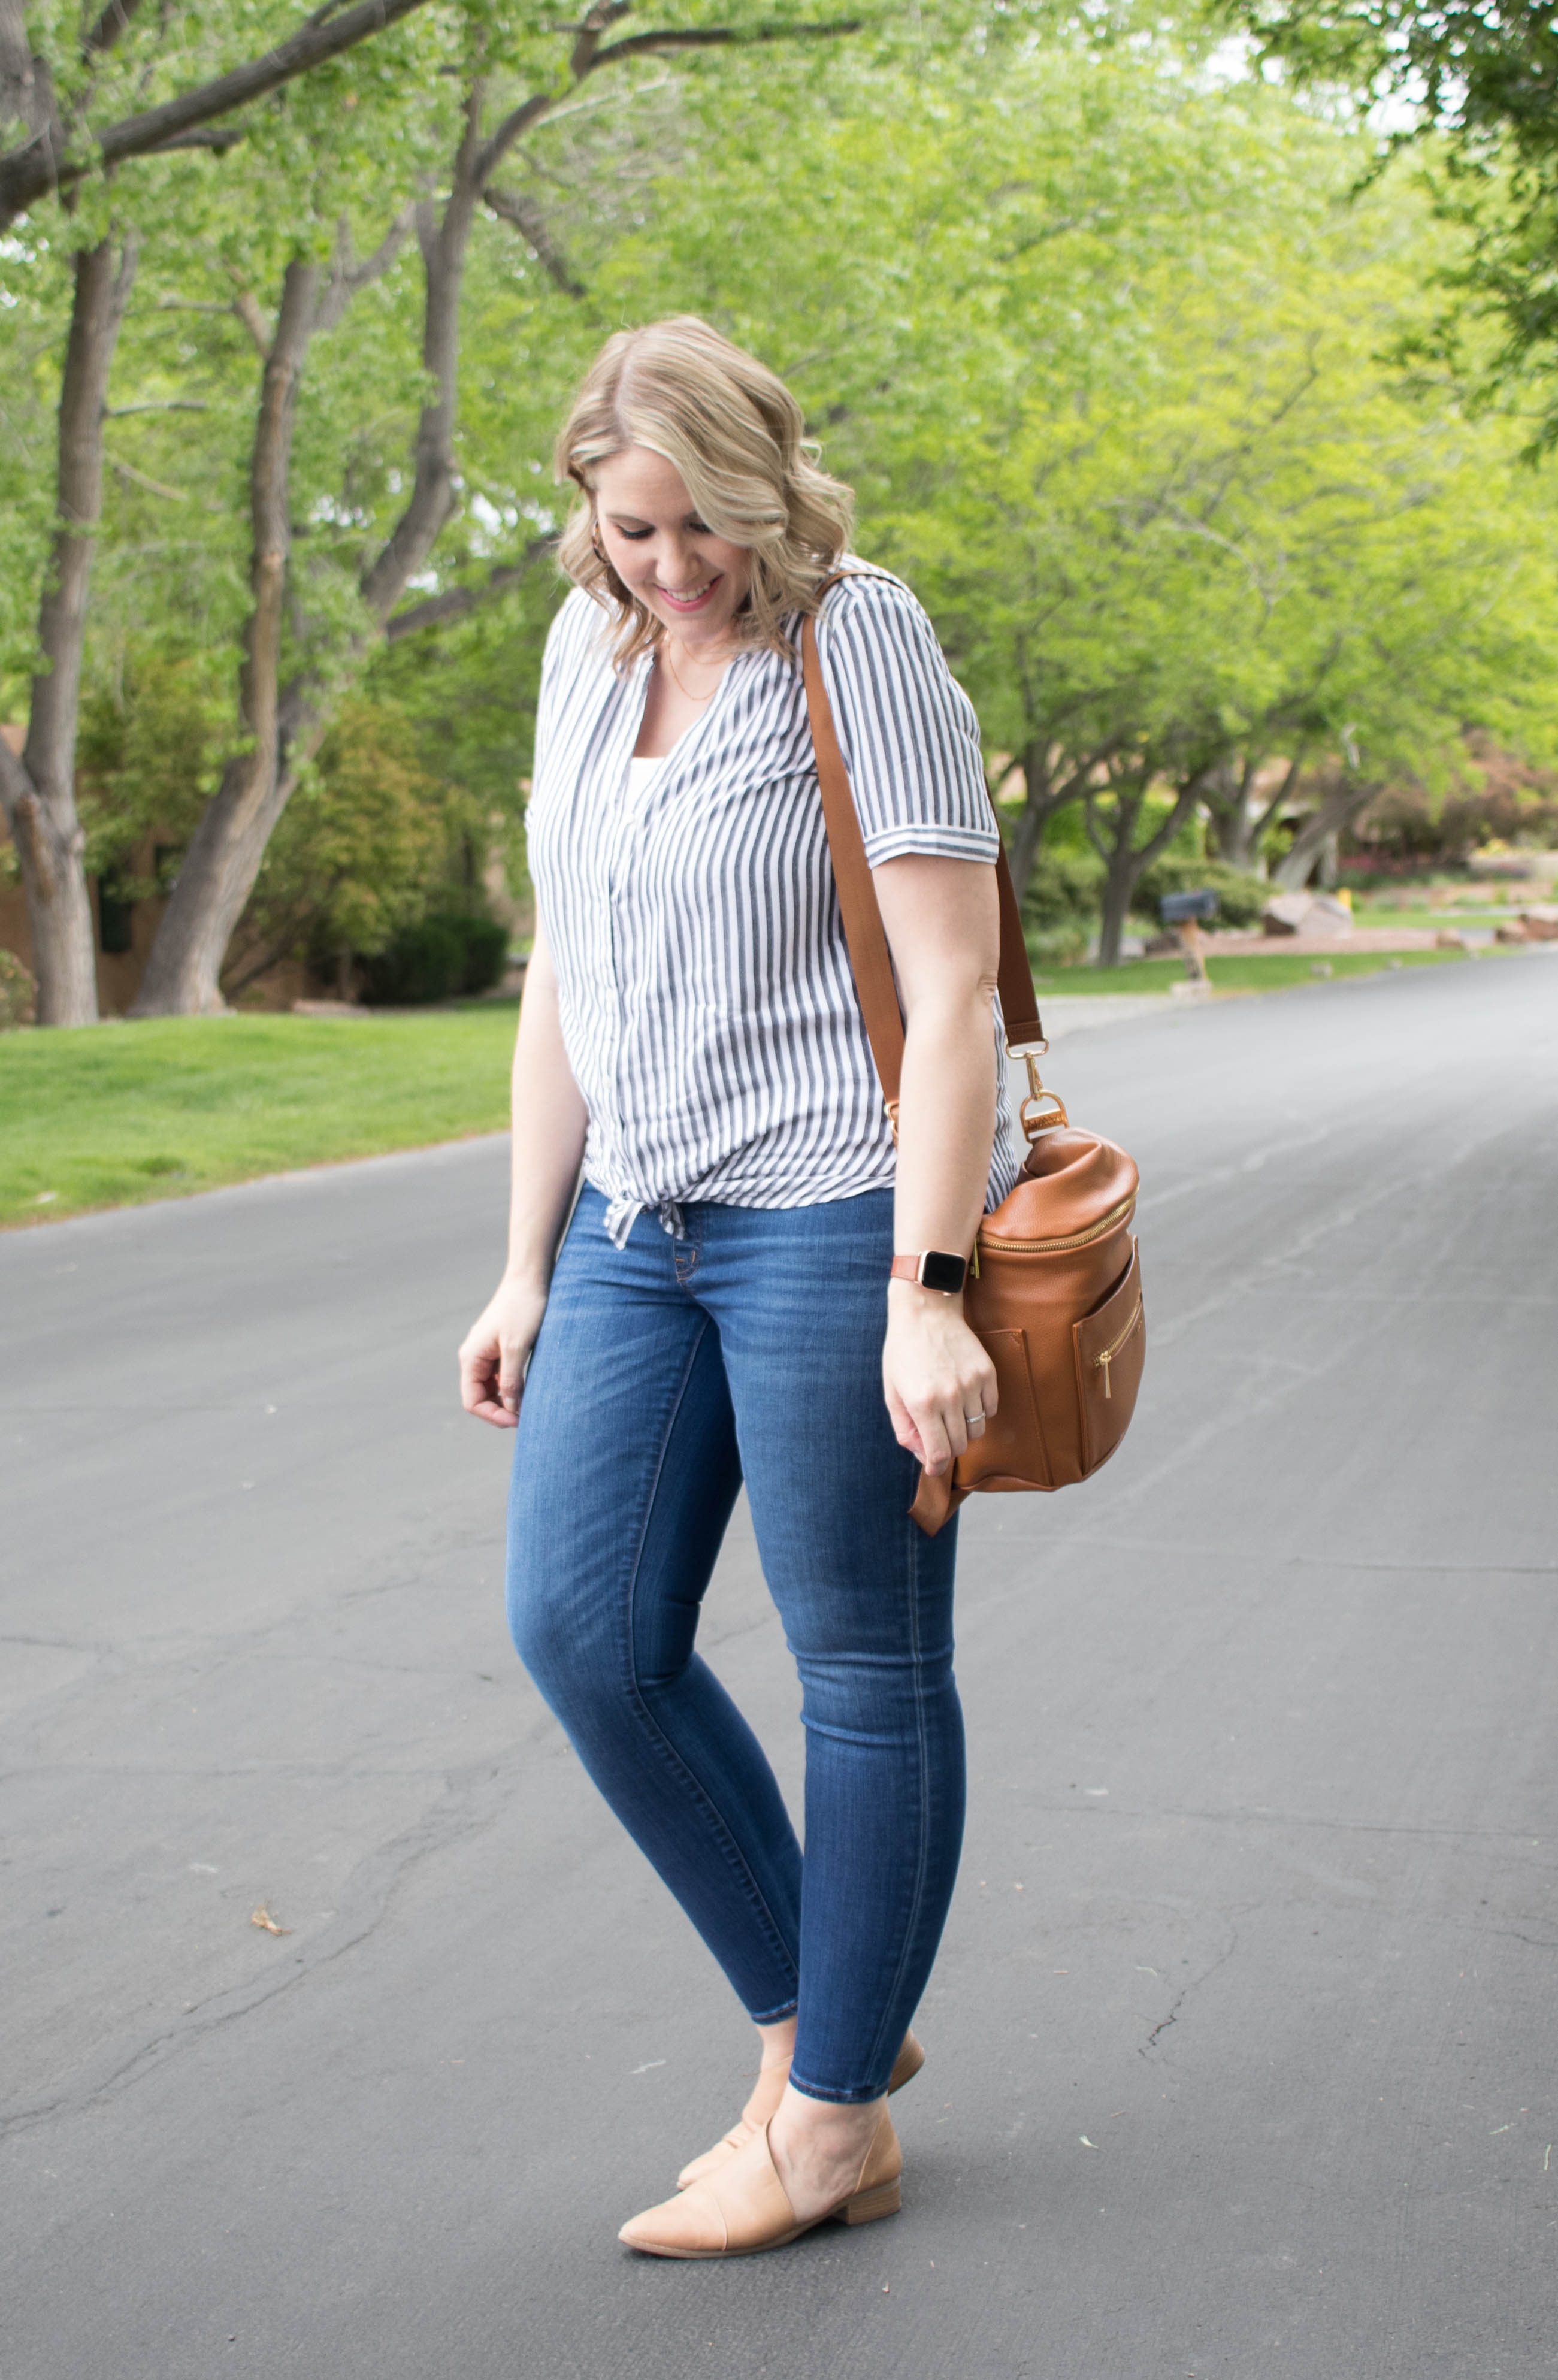 madewell maternity jeans #madewell #everydaymadewell #maternityjeans